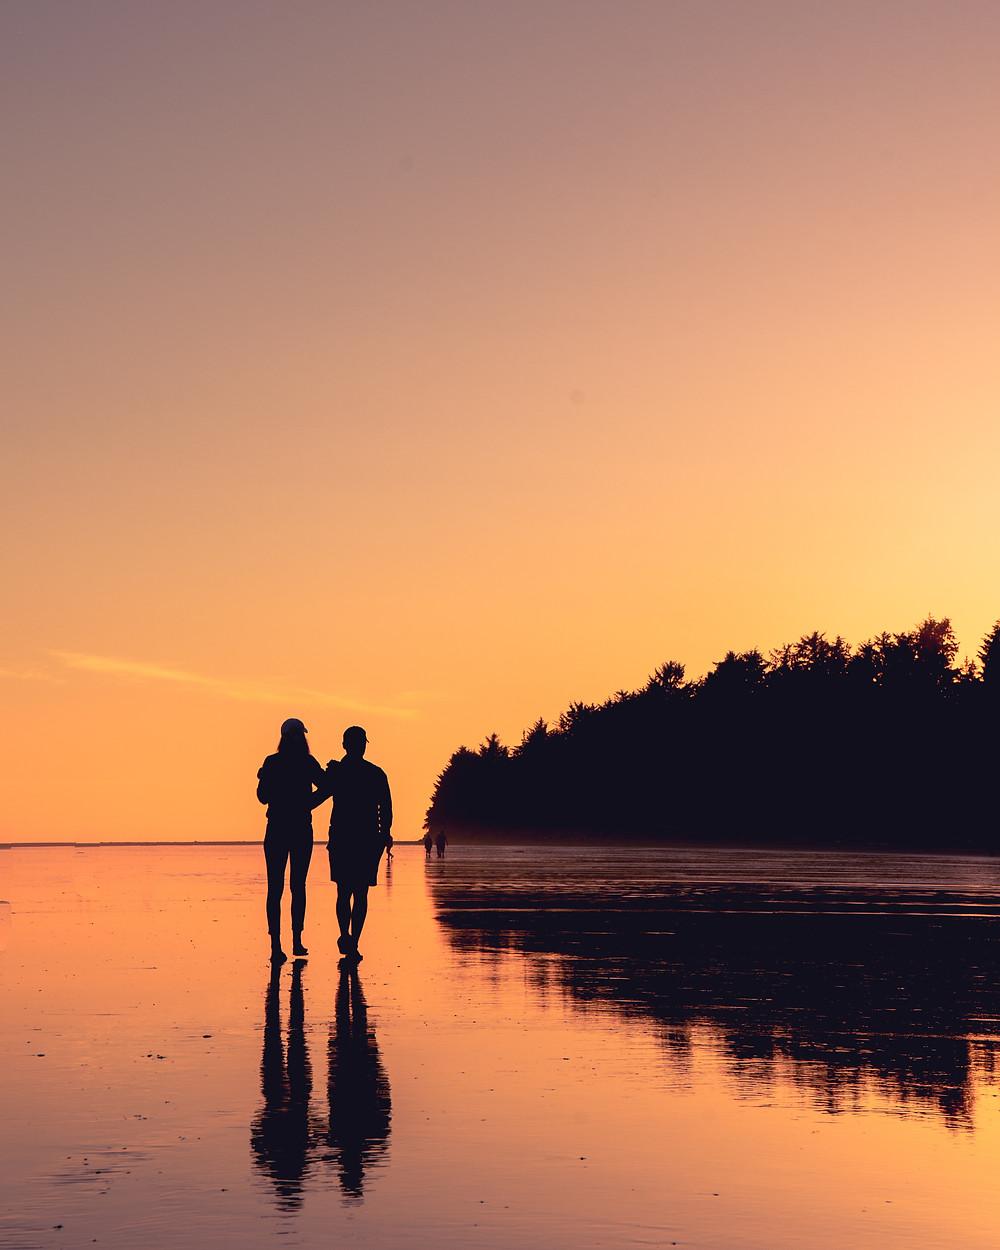 Sunset walks by the beach